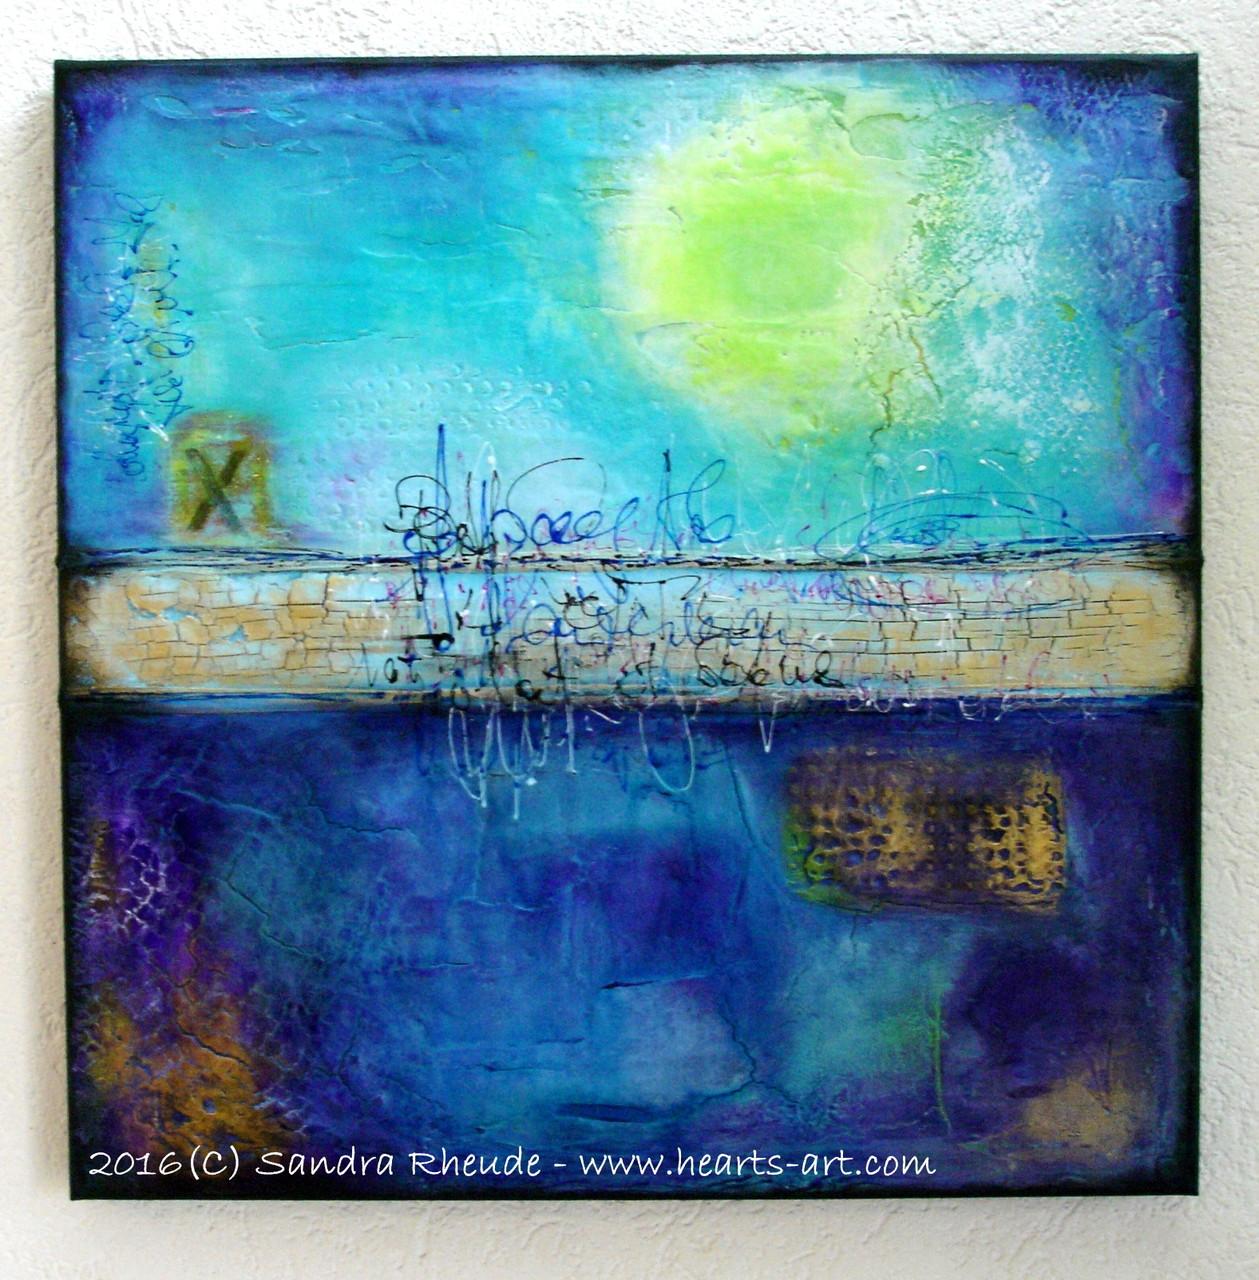 'Treasure Island' -  2016/17 - Acryl/MixedMedia auf Leinwand - 70 x 70 x 4,0 cm - € 1111